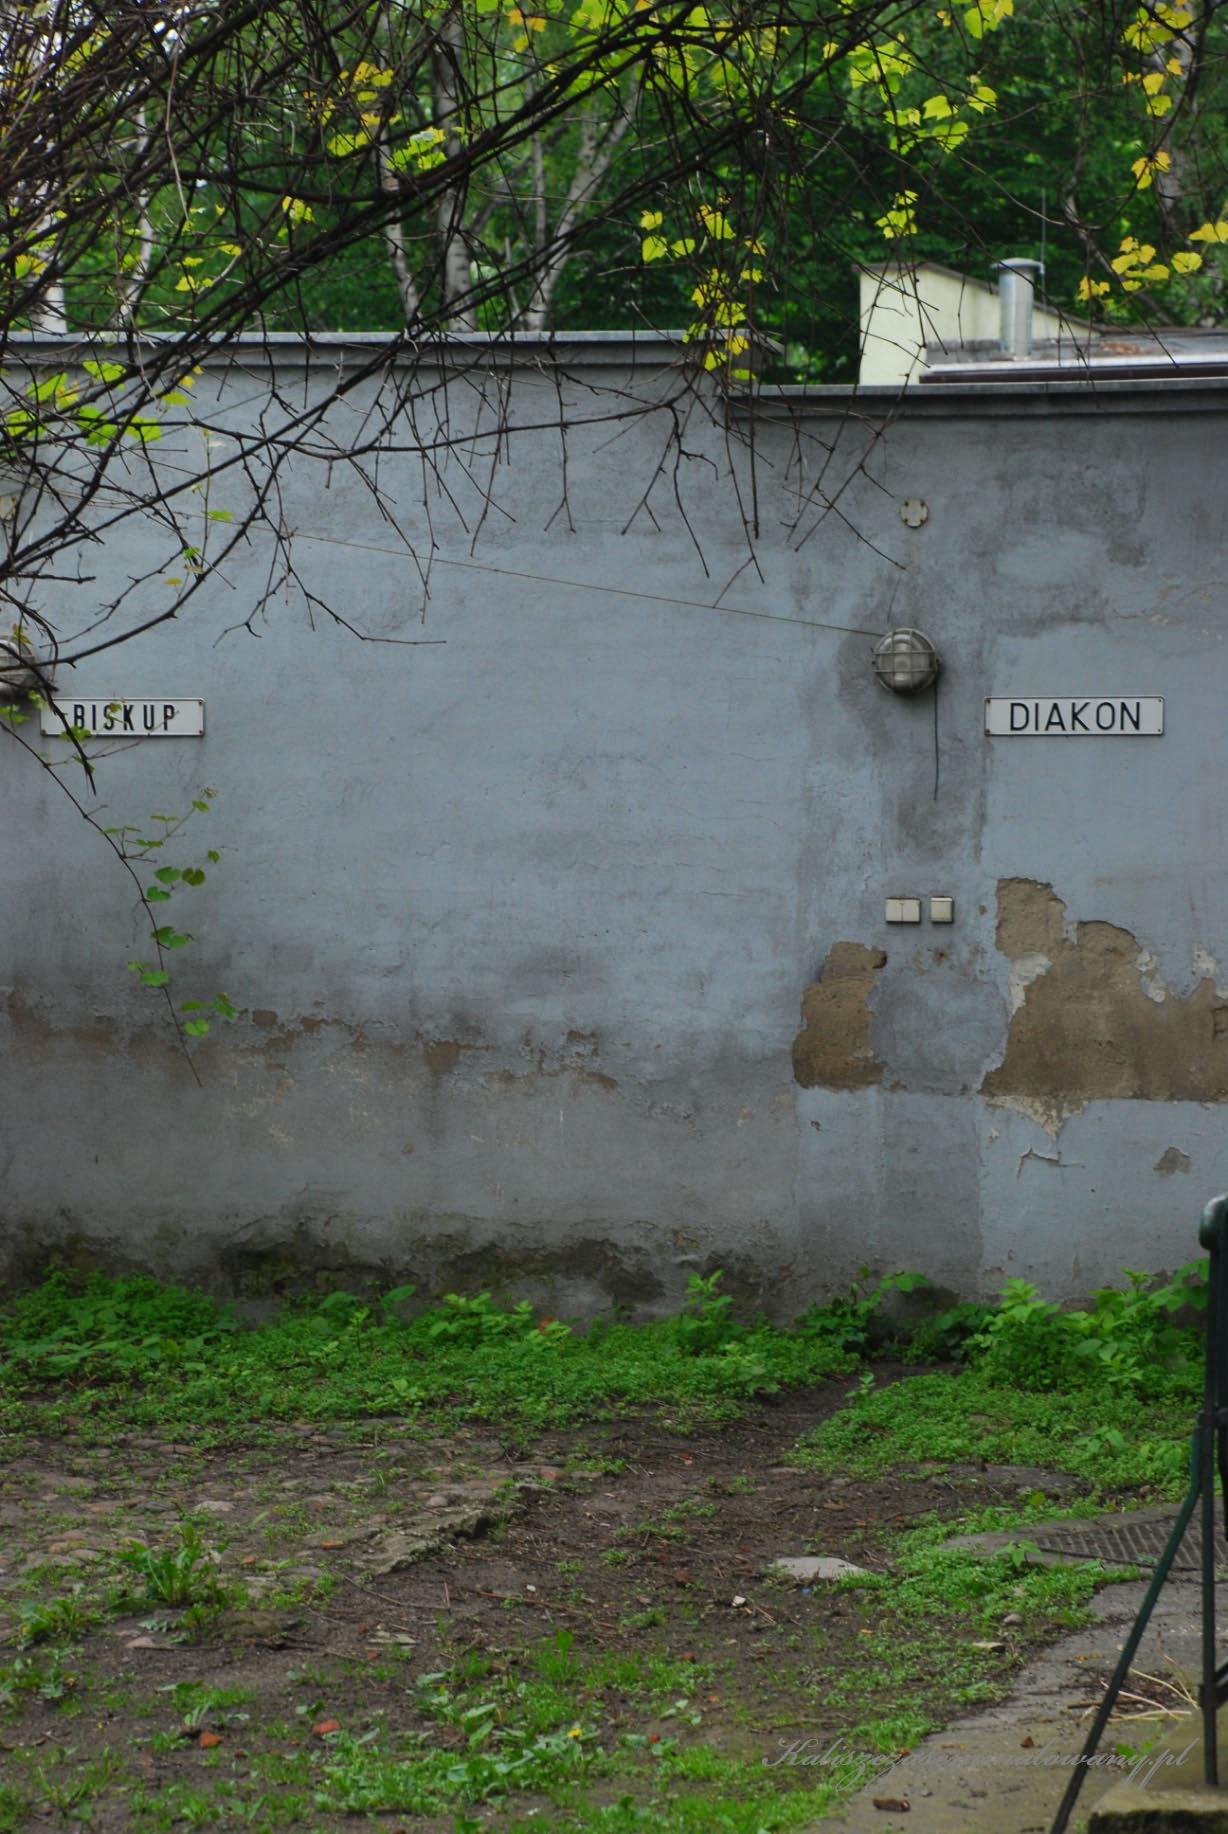 Dom_pod_anilolami-19